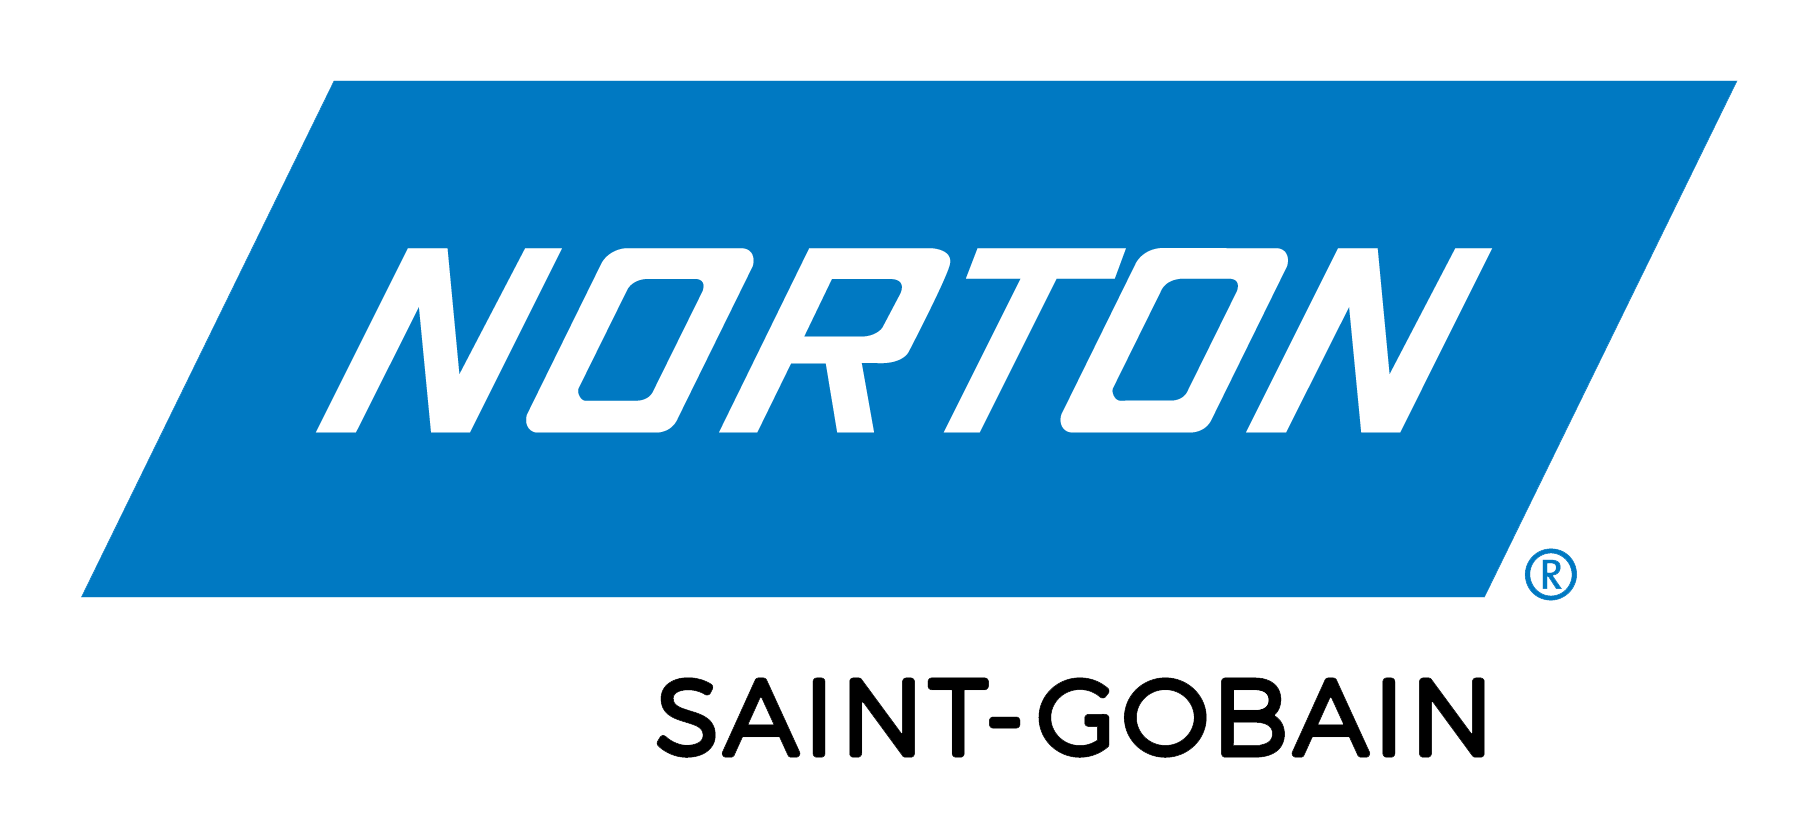 SG_Norton_logo_rgb_25